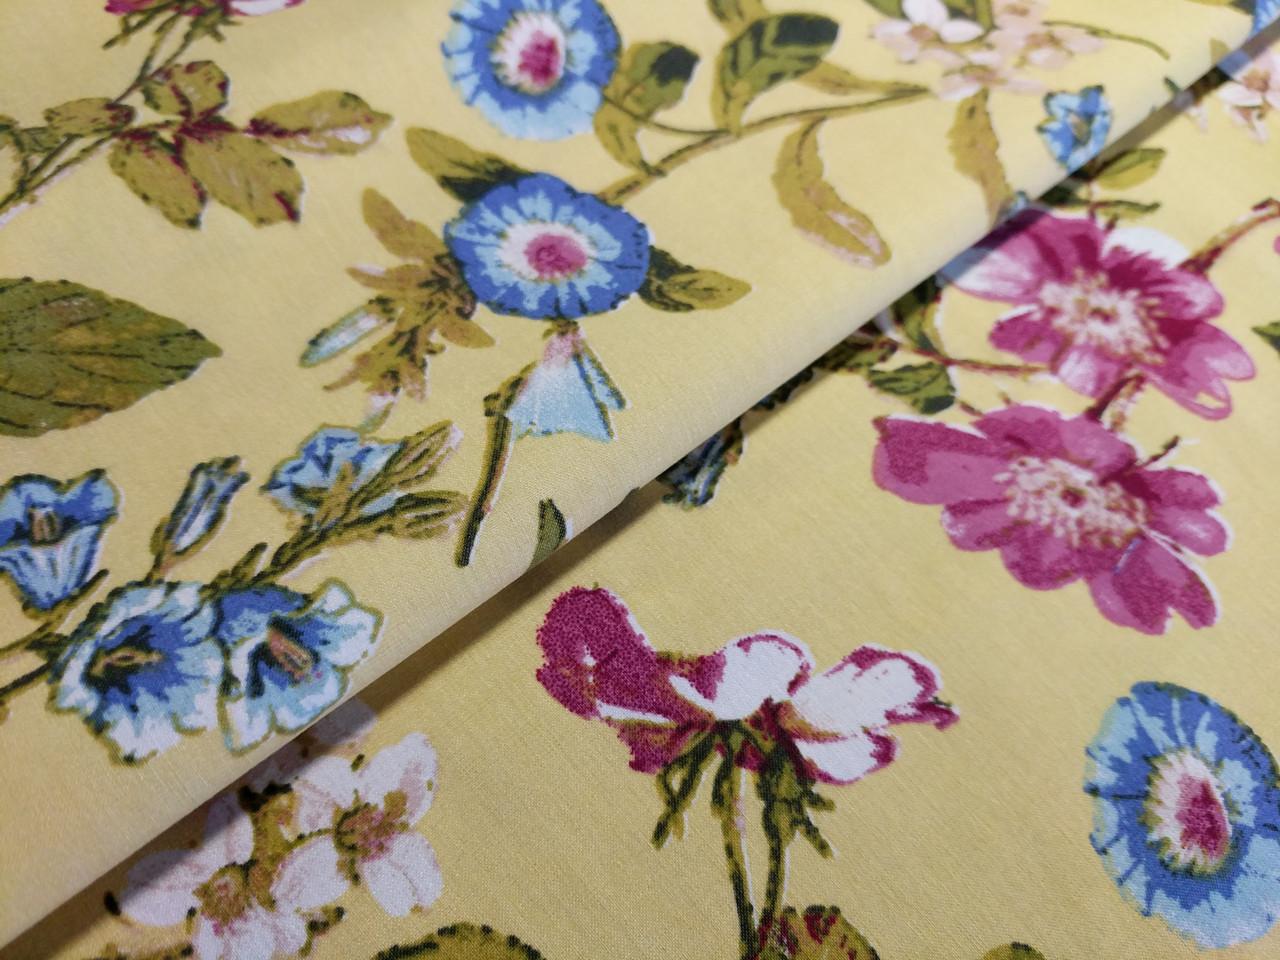 Бенгалин рисунок цветочная фантазия, бледно-желтый